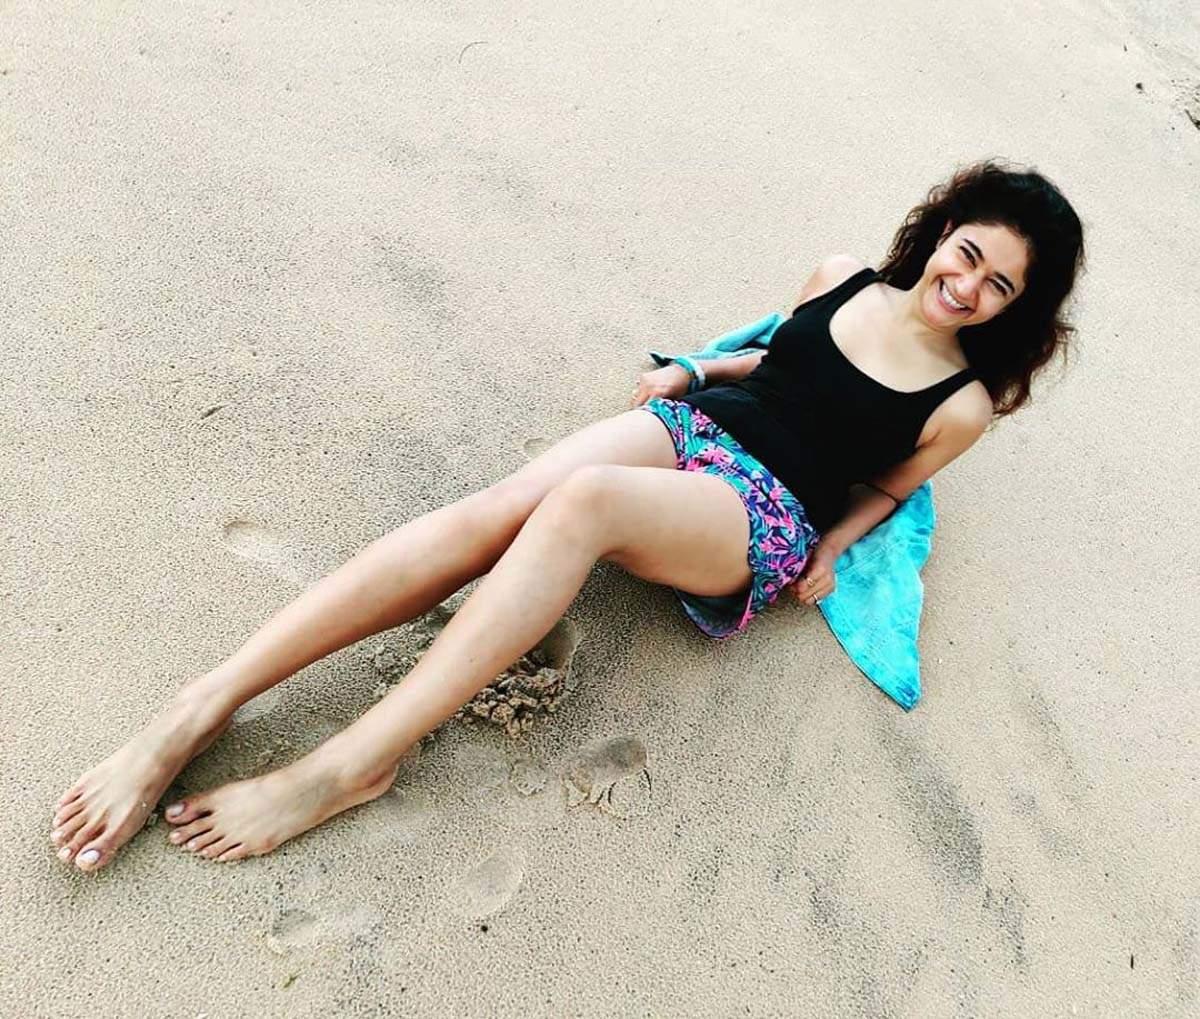 Telugu actress Poonam Bajwa shares beautiful sun kissed pictures